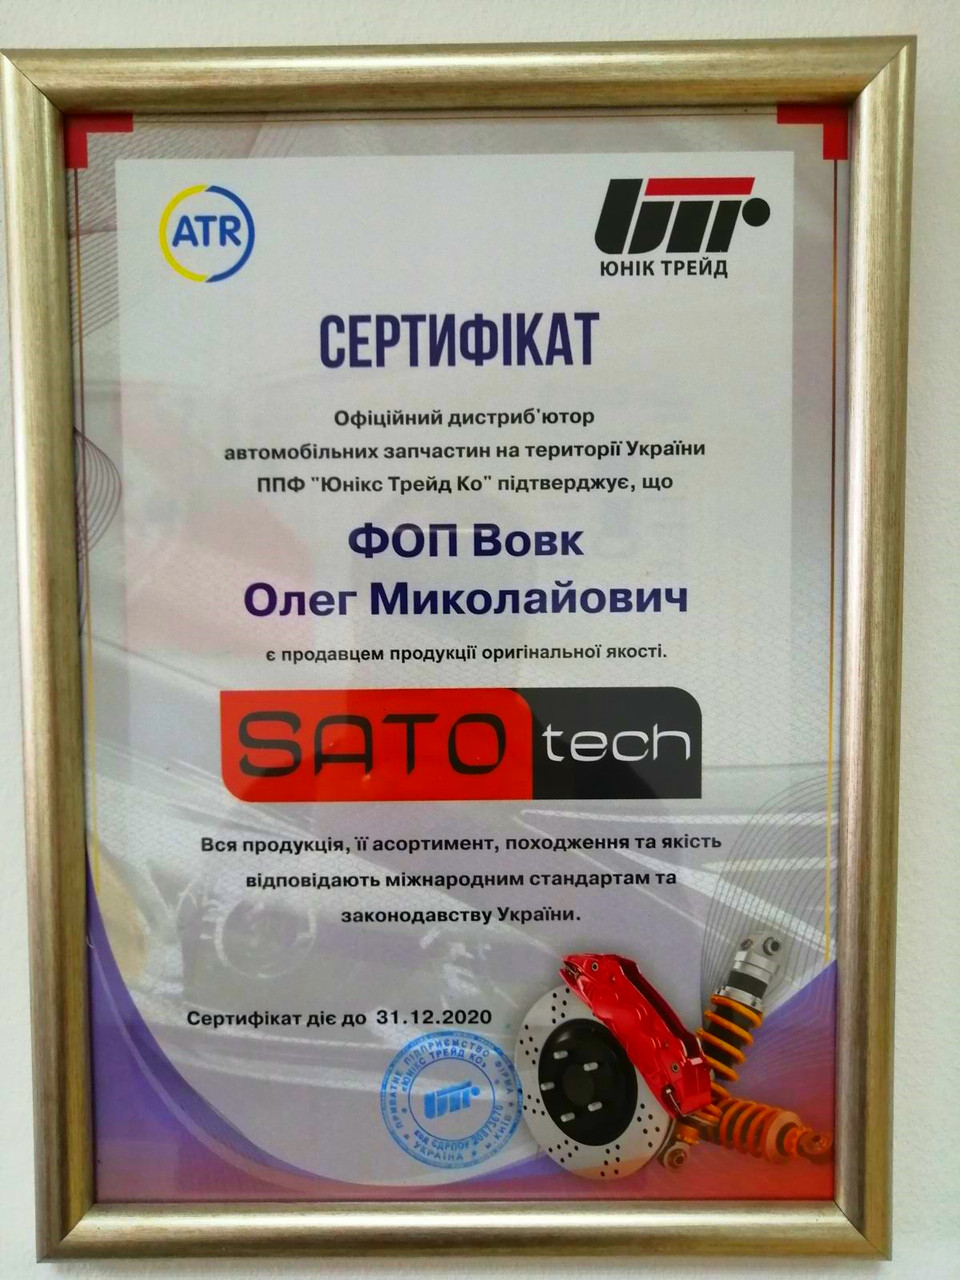 SATO Амортизатор Premium MB M-class (W164) 05-